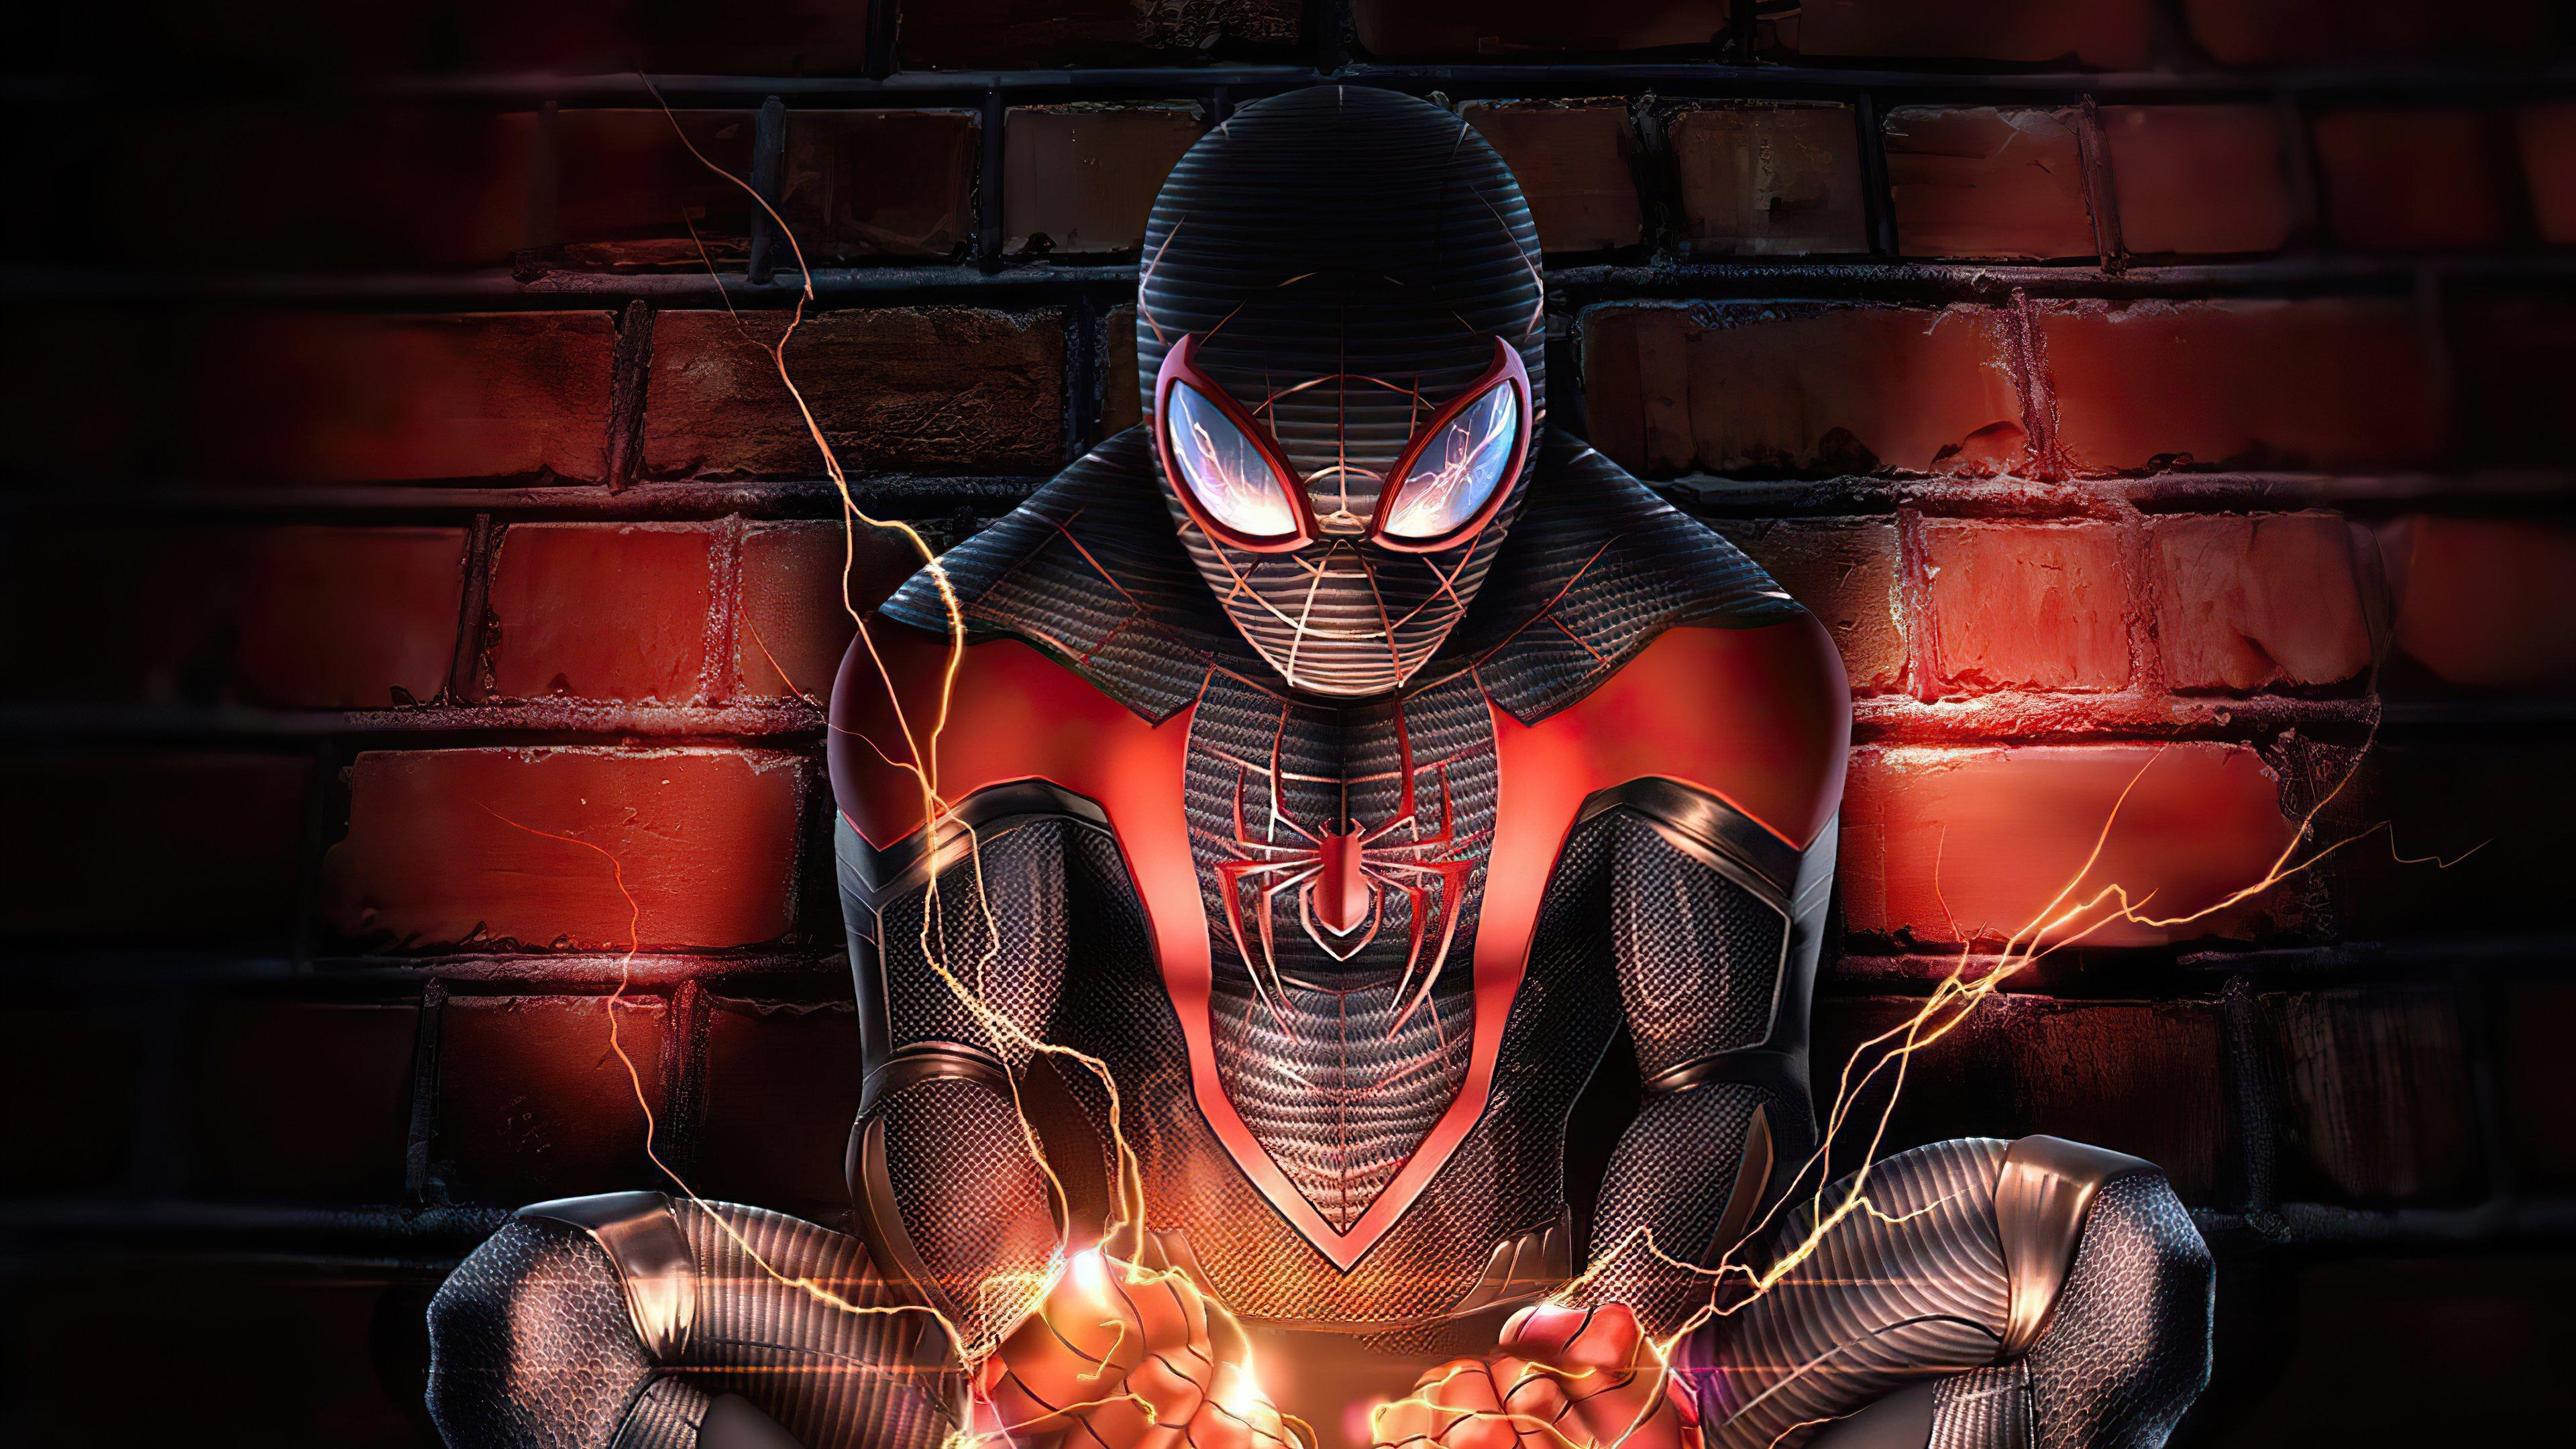 Fondos de pantalla El hombre araña Artwork